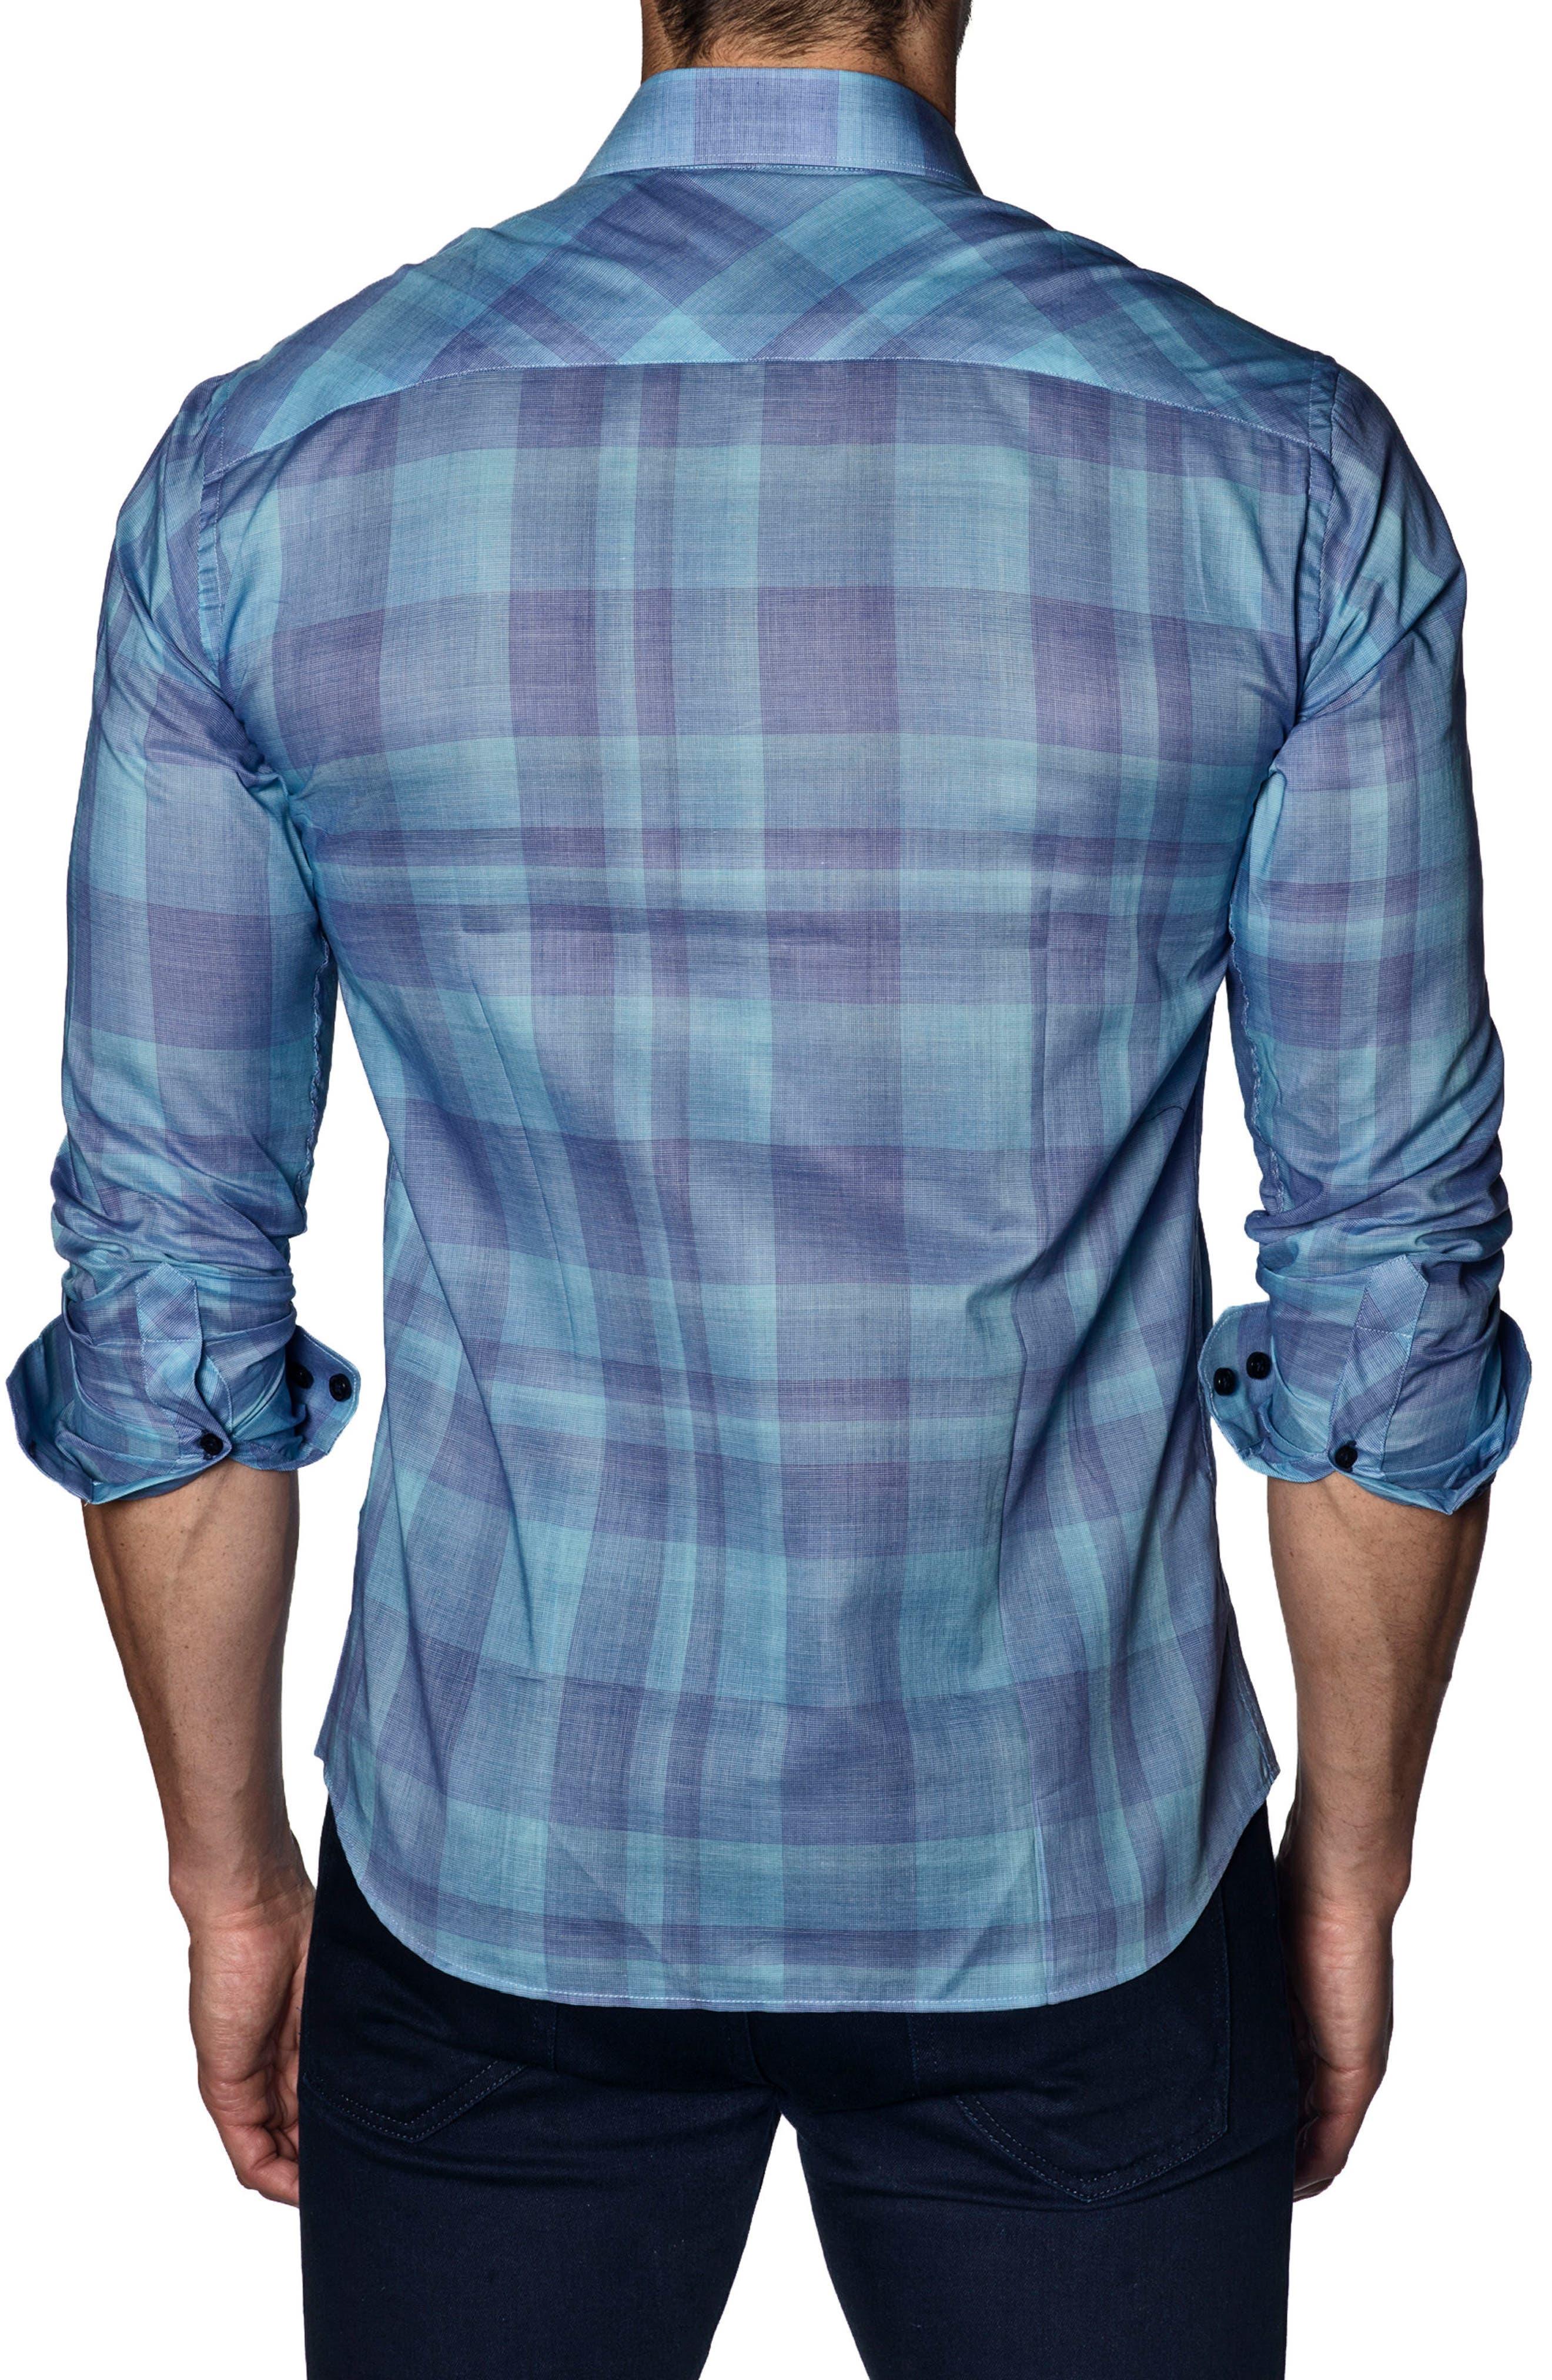 Trim Fit Sport Shirt,                             Alternate thumbnail 2, color,                             Turquoise Check